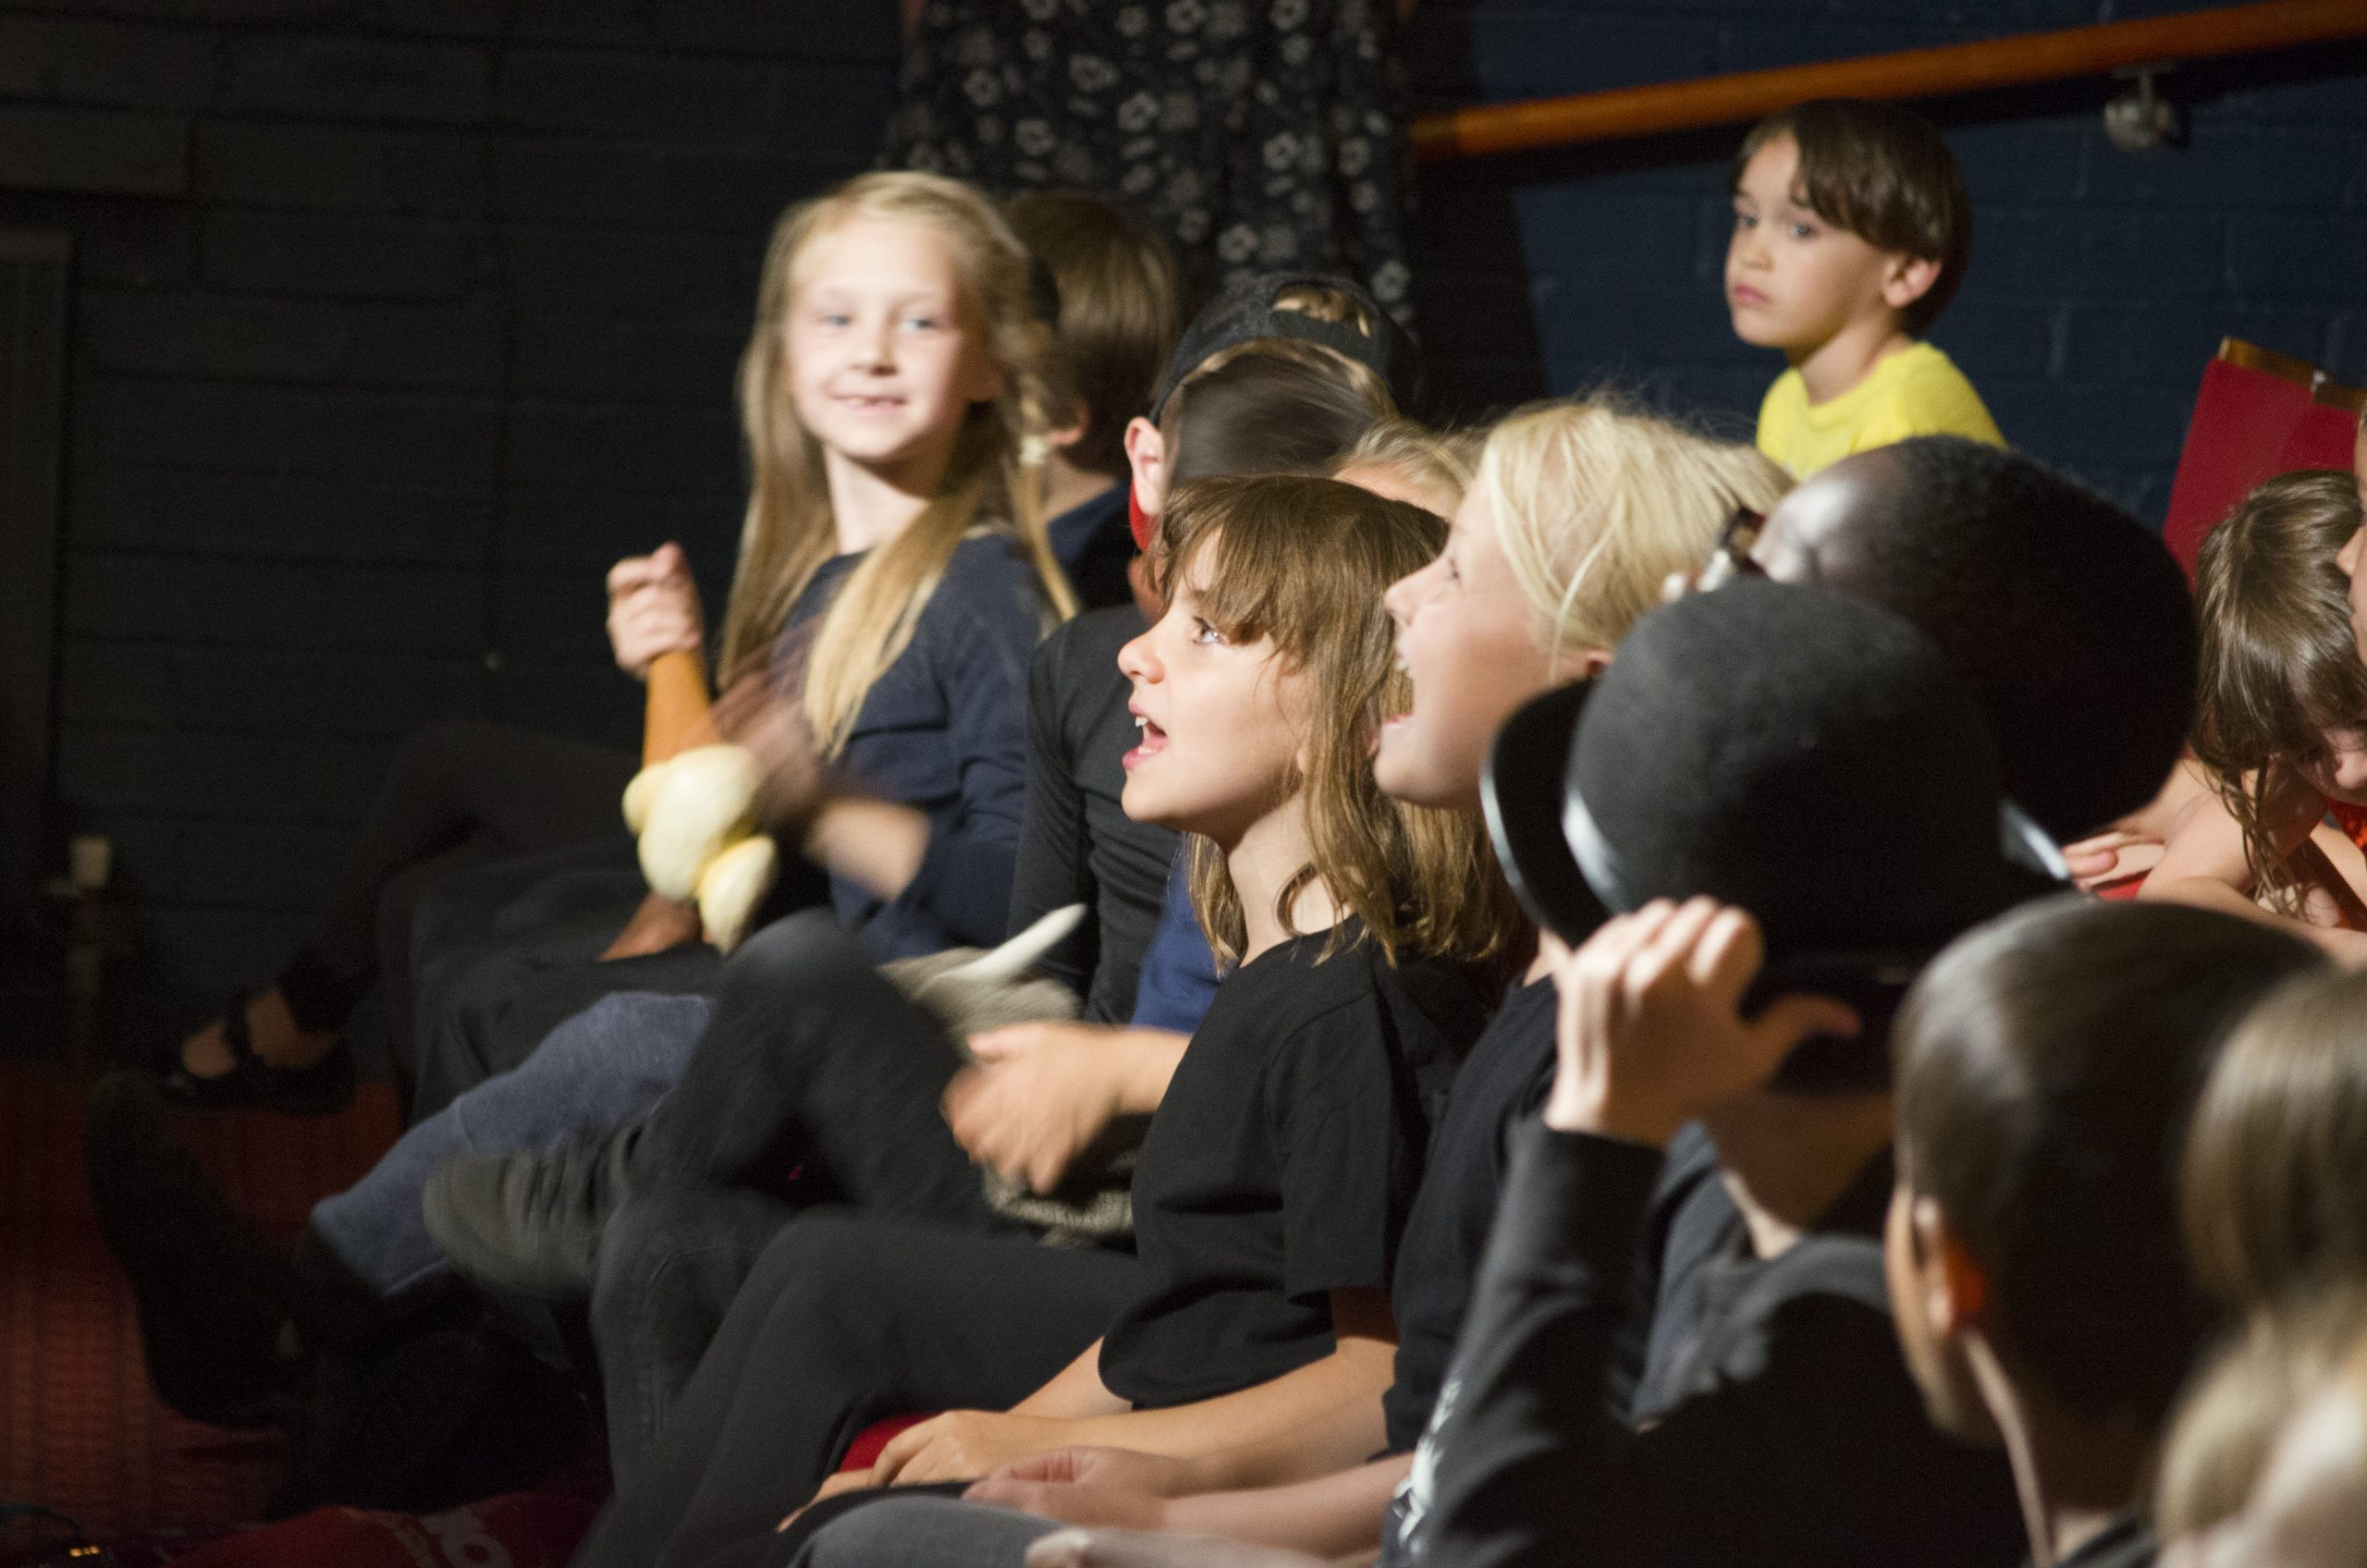 Children watching a performance